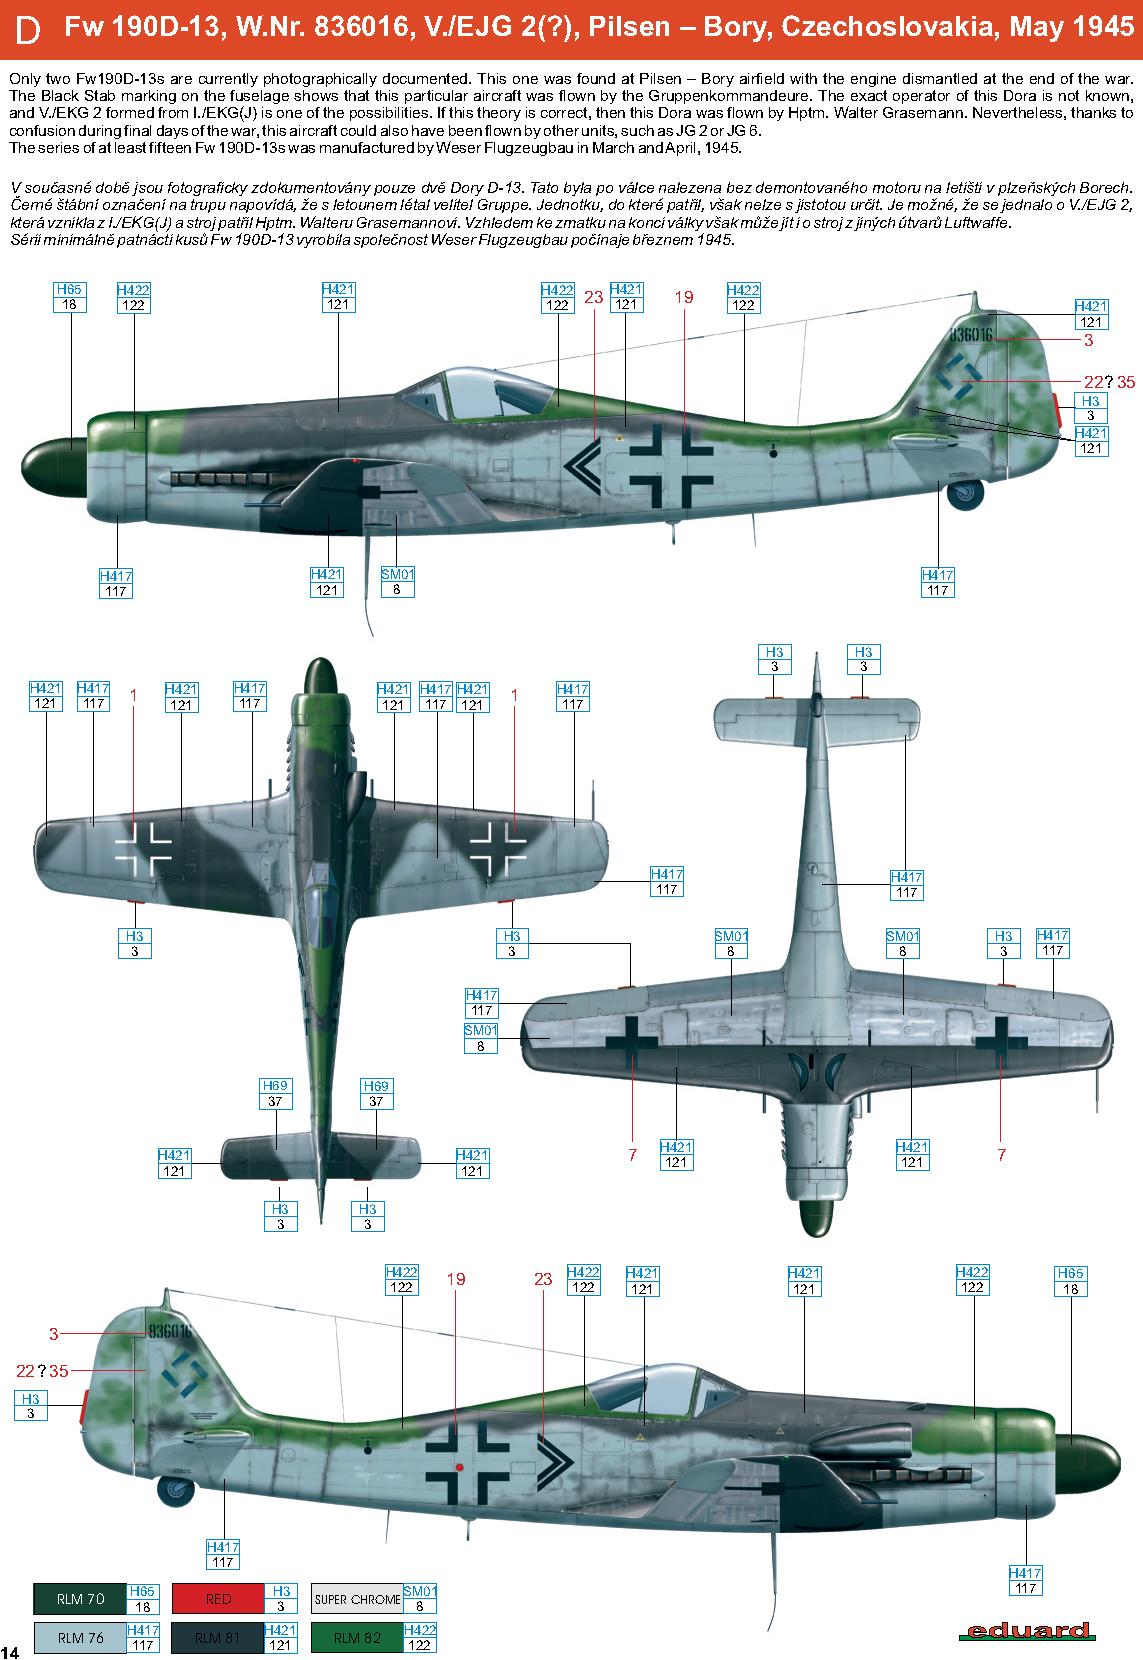 Art-Focke-Wulf-Fw-190D13-I.EKG(J)-WNr-836016-Walter-Grasemann-Pilsen-Czechoslovakia-1945-0A.jpg